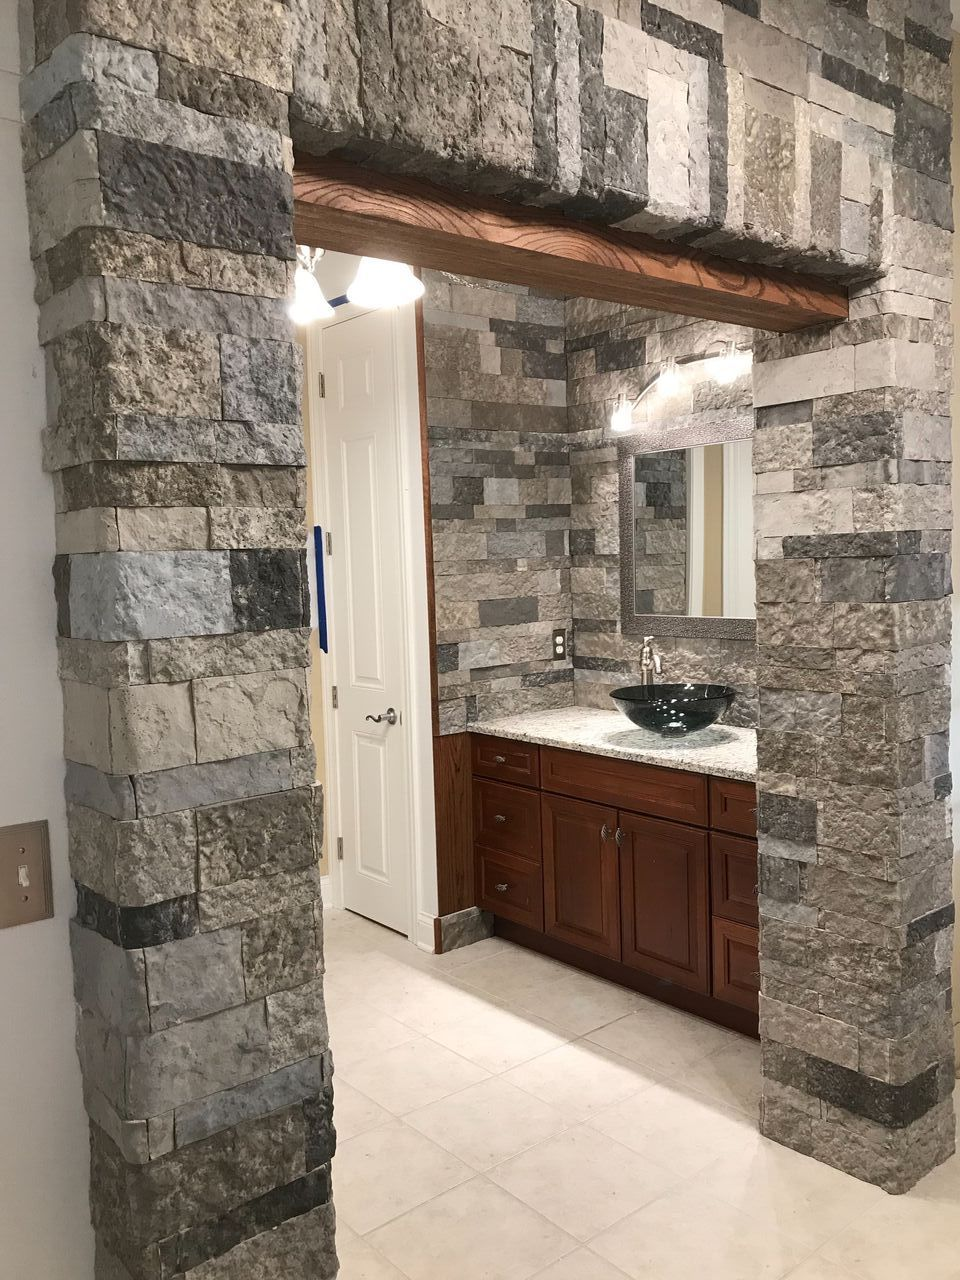 AirStone bathroom remodel. #fauxstone #DIY | Airstone ...